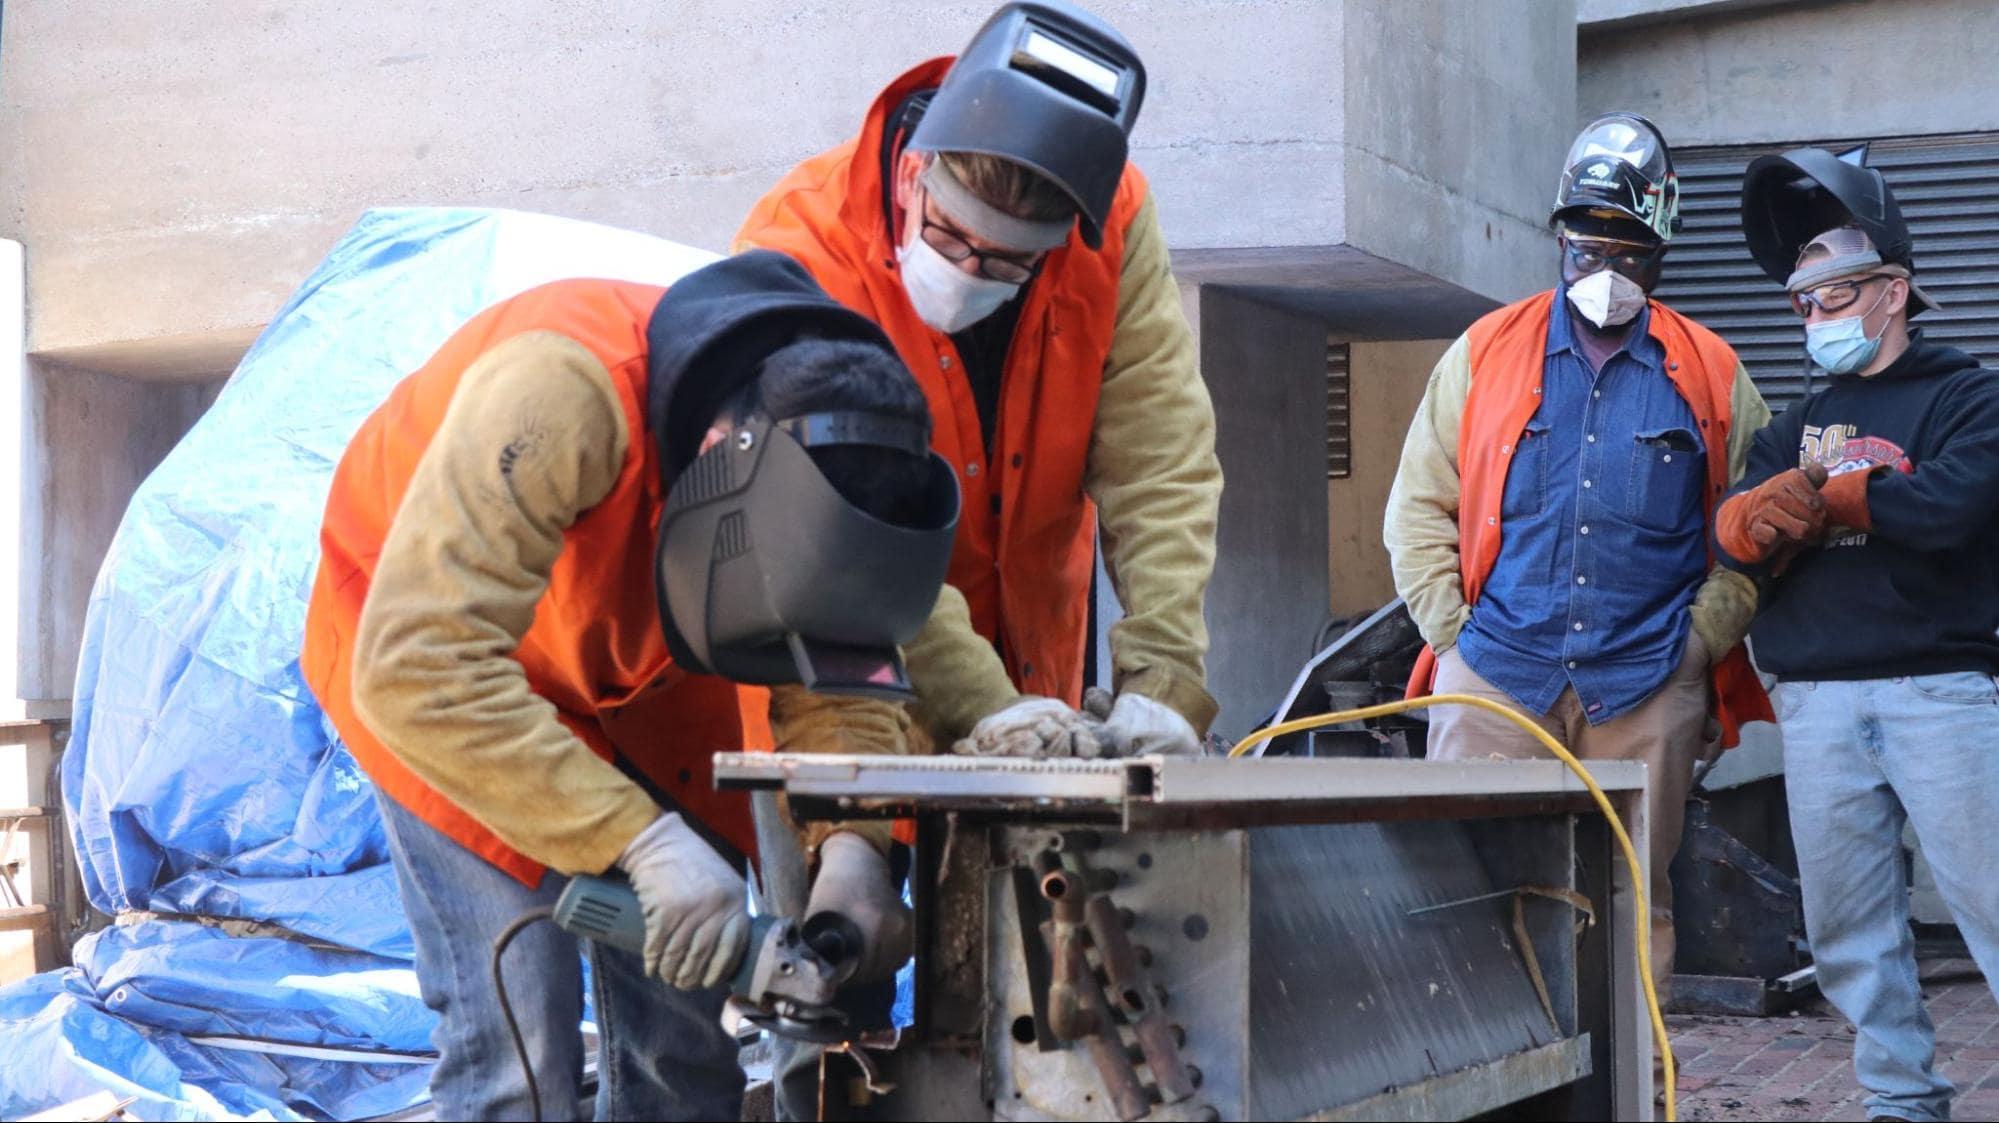 Plumbing certification course